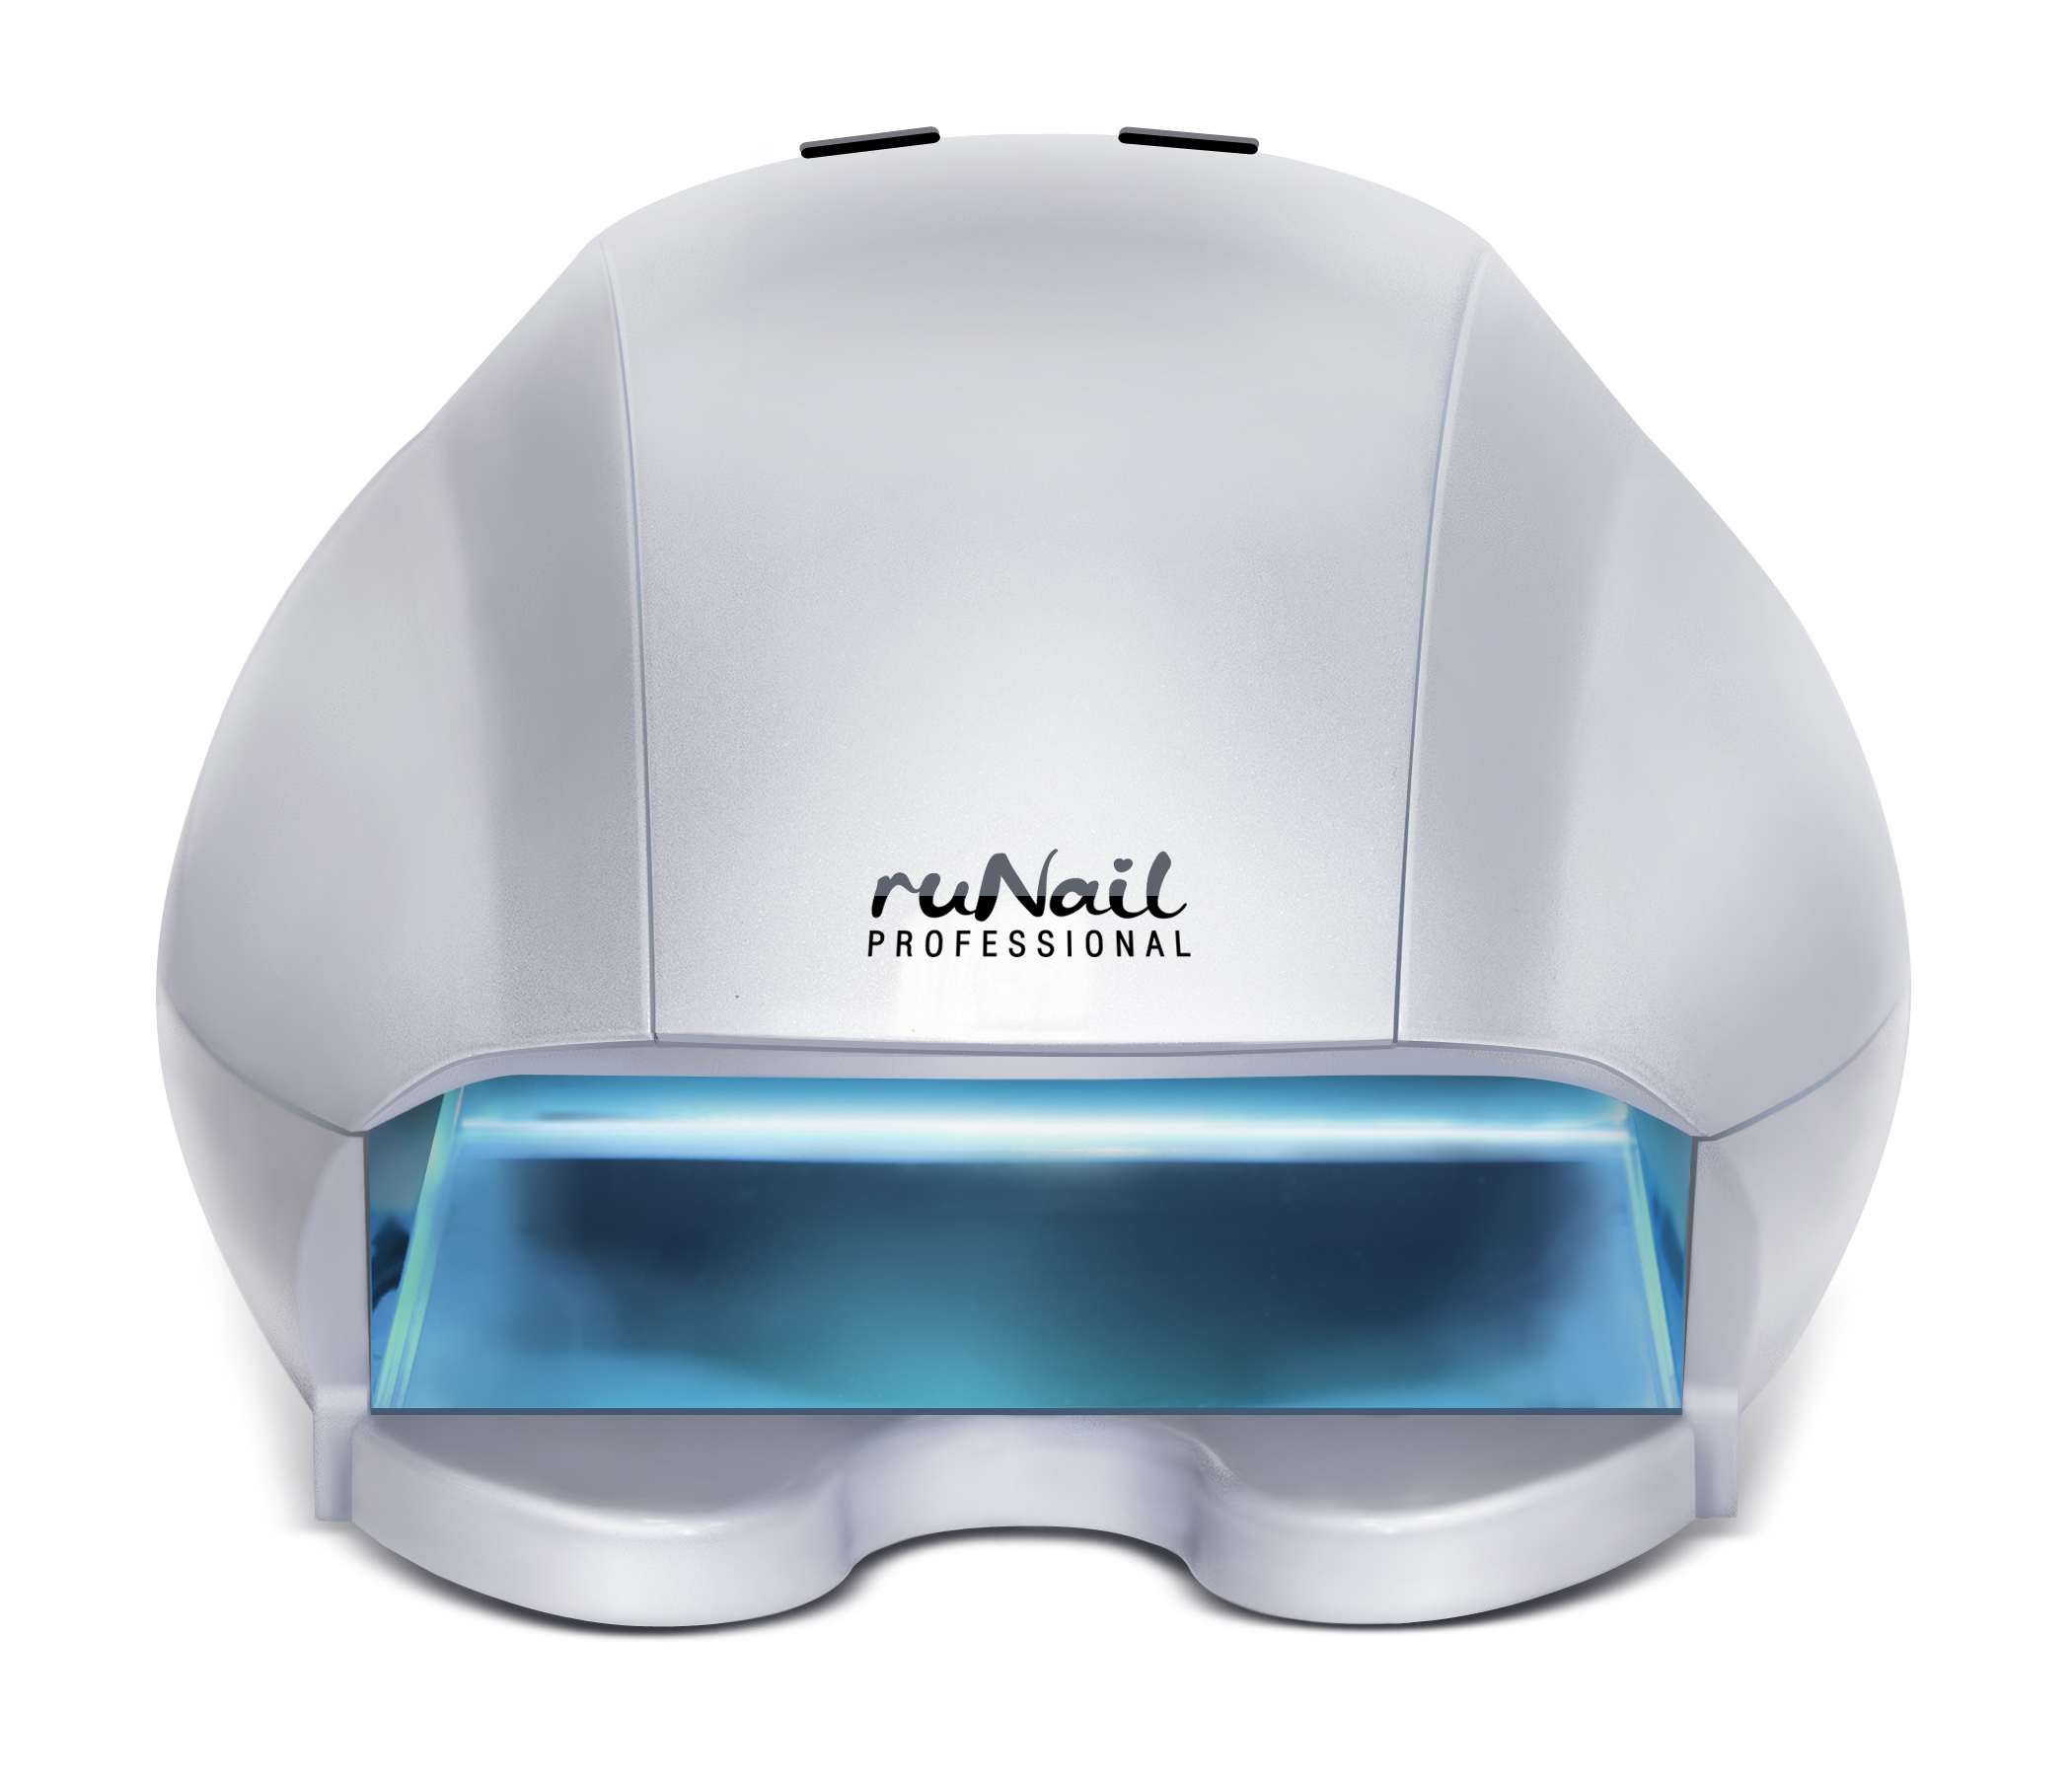 RuNail Лампа UV-LED 12 Вт, серебряная - Оборудование для маникюра